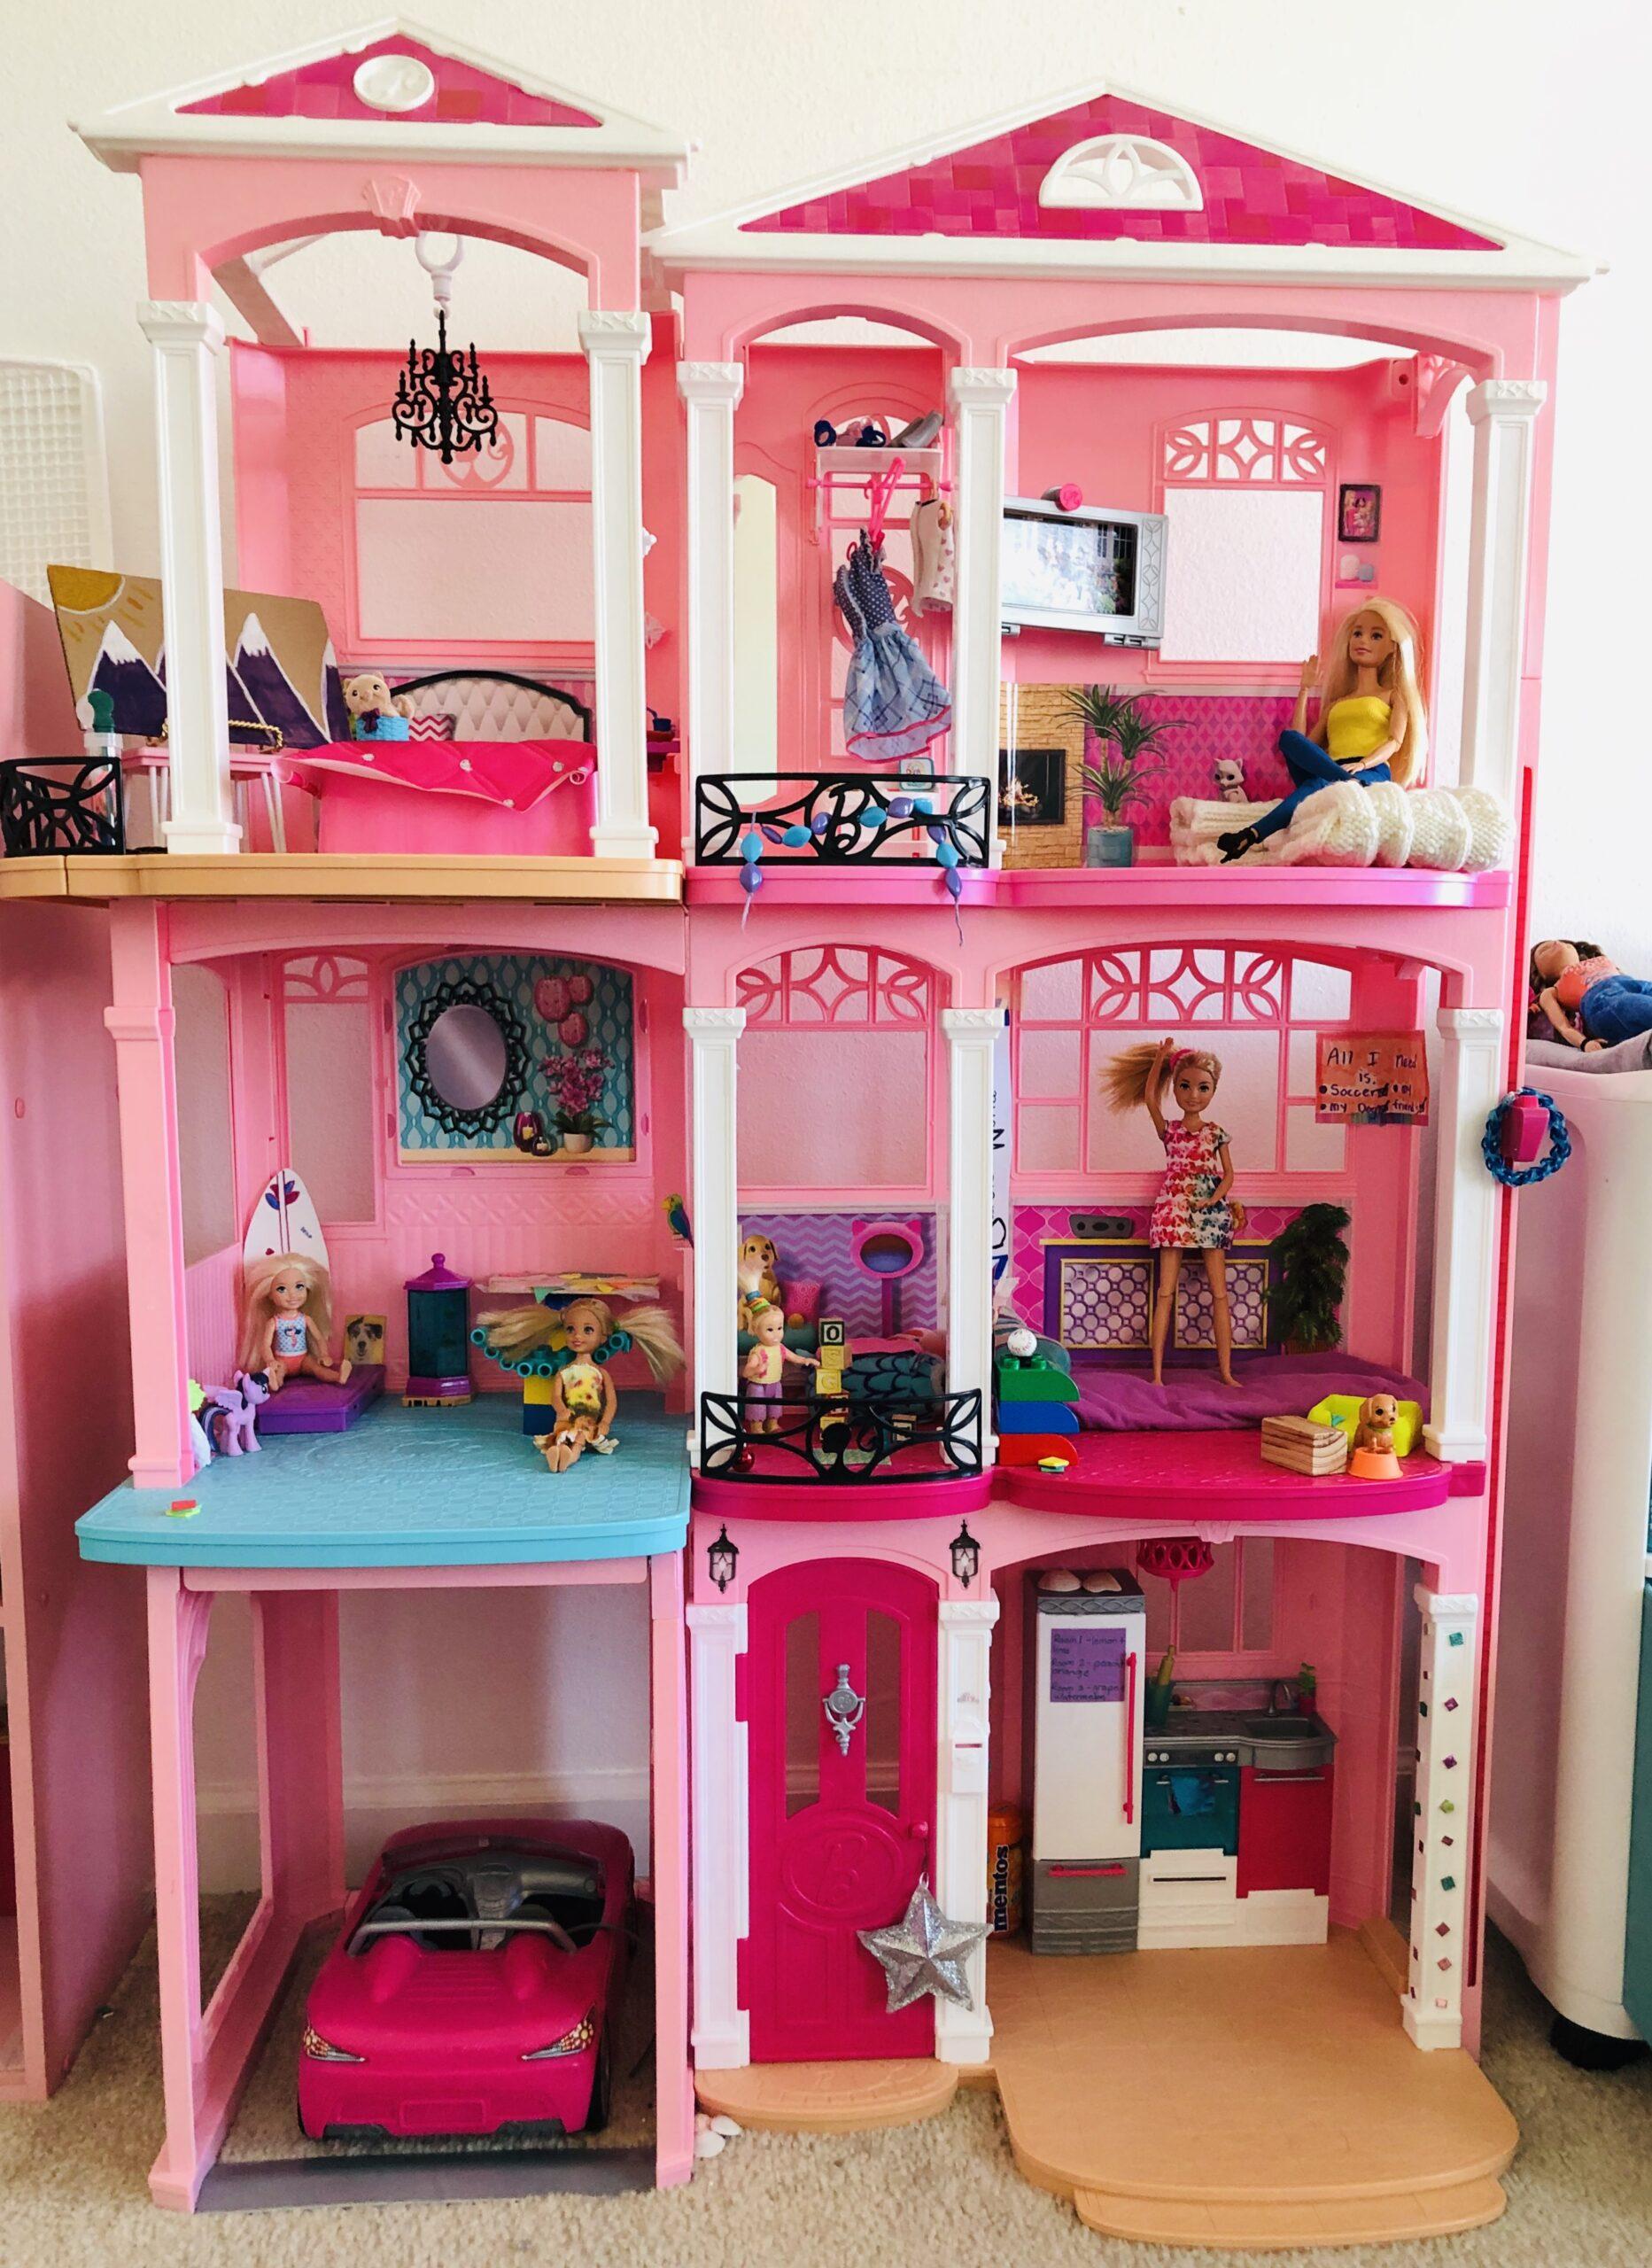 Barbie dream house for the Barbie short story.